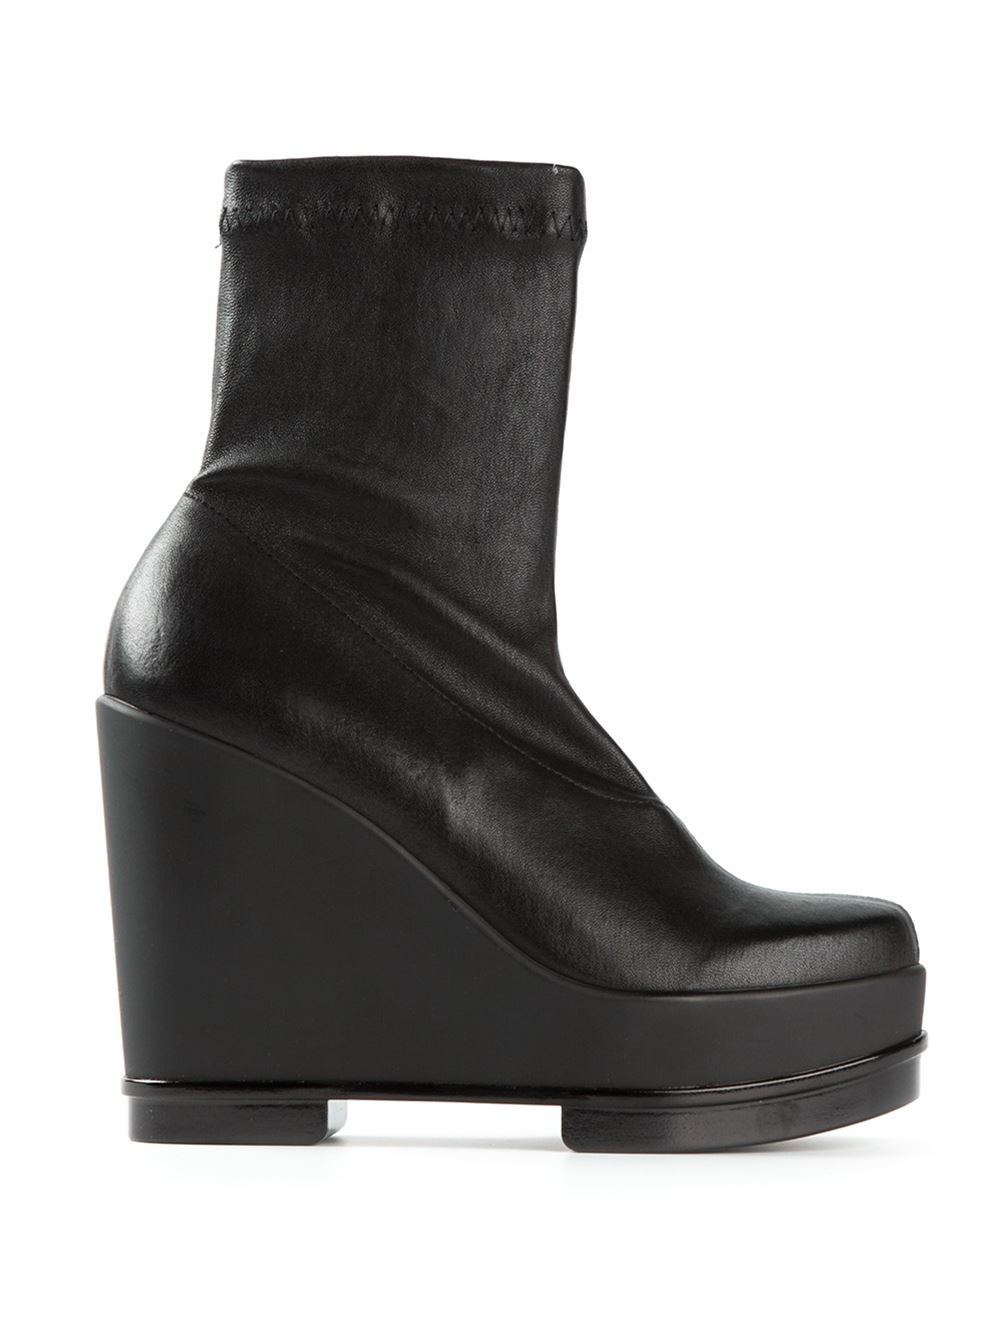 e3ede4182ae Robert Clergerie Platform Ankle Boots - Wok-store - Farfetch.com ...